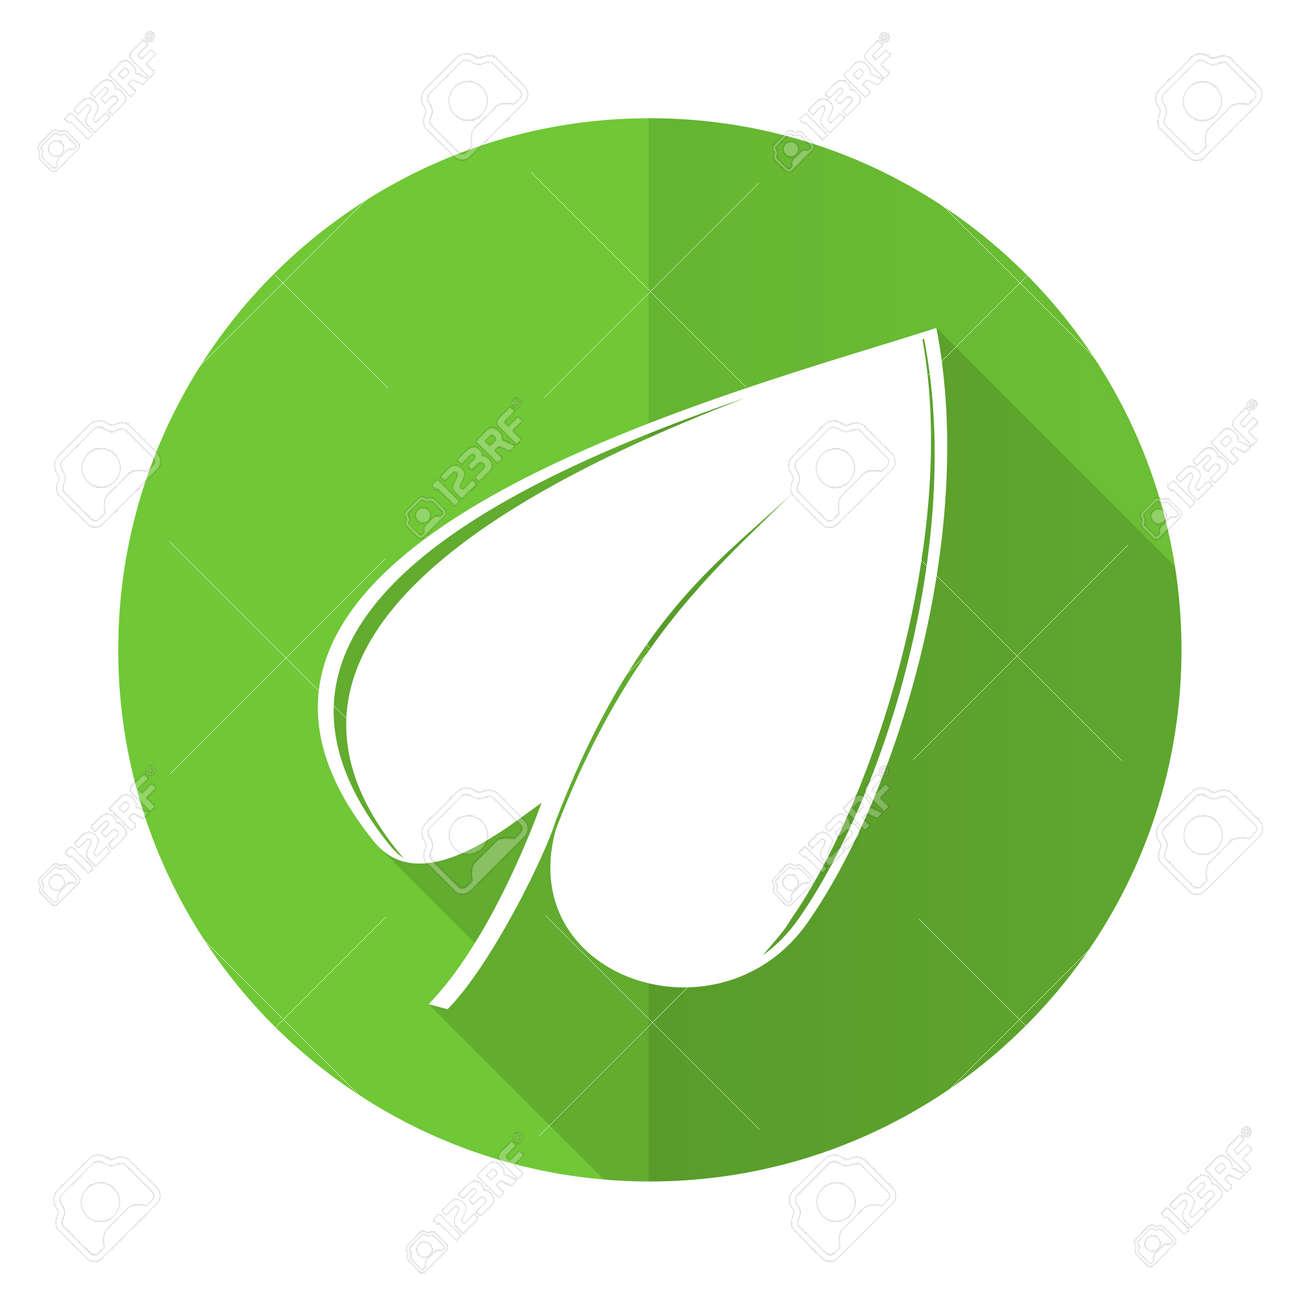 Nature green flat icon leaf symbol stock photo picture and royalty nature green flat icon leaf symbol stock photo 38135958 biocorpaavc Gallery